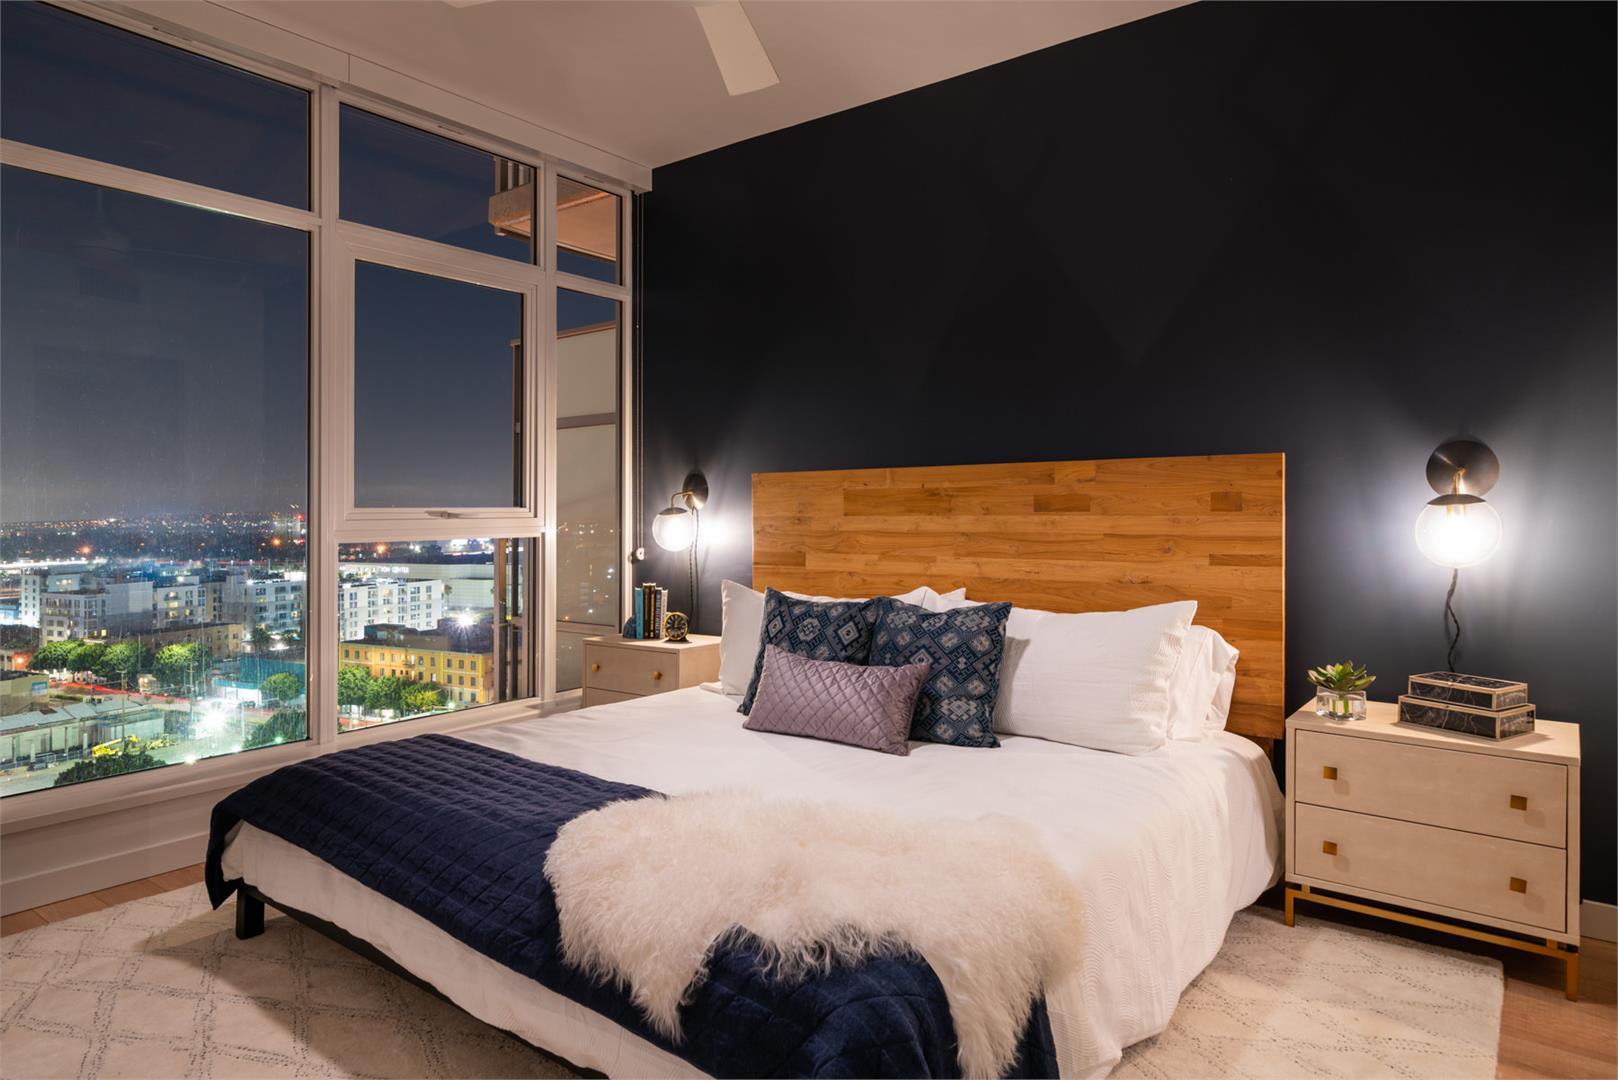 Cozy Up In Hope Flower S Elegant Master Bedroom Retreats